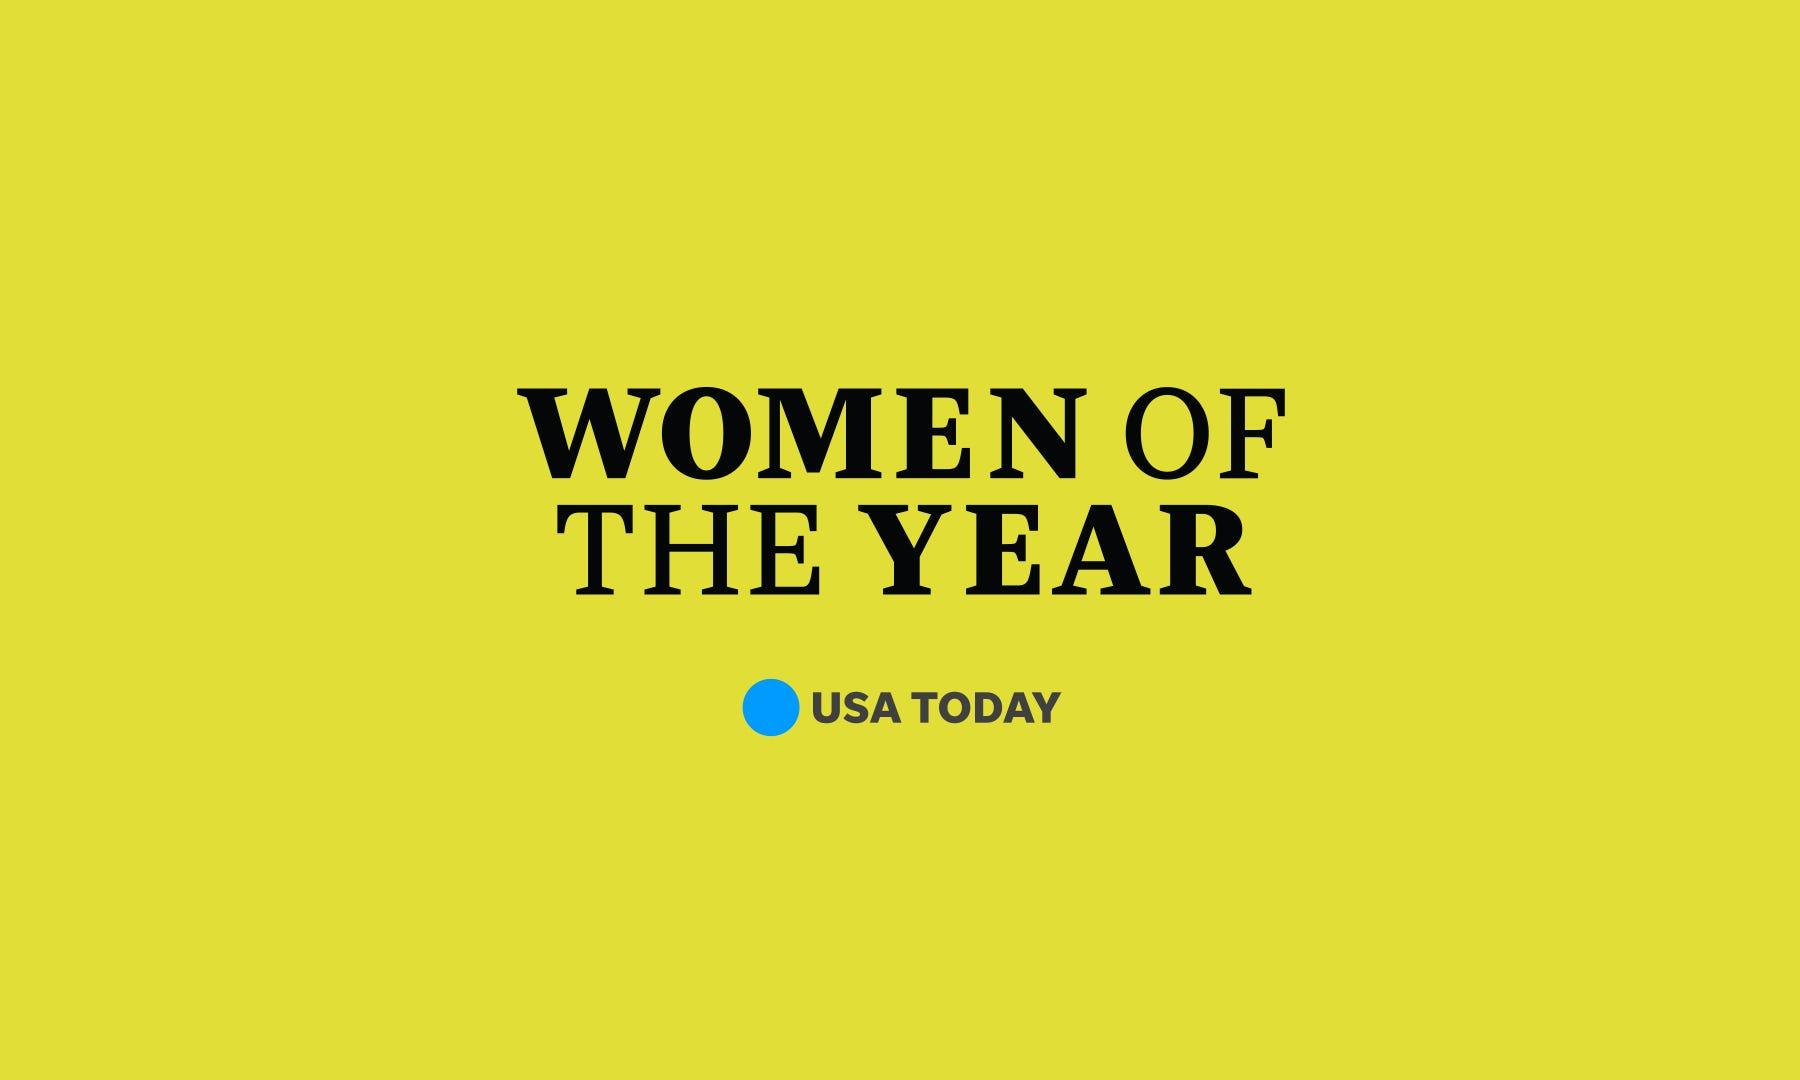 Women of the Year wordmark